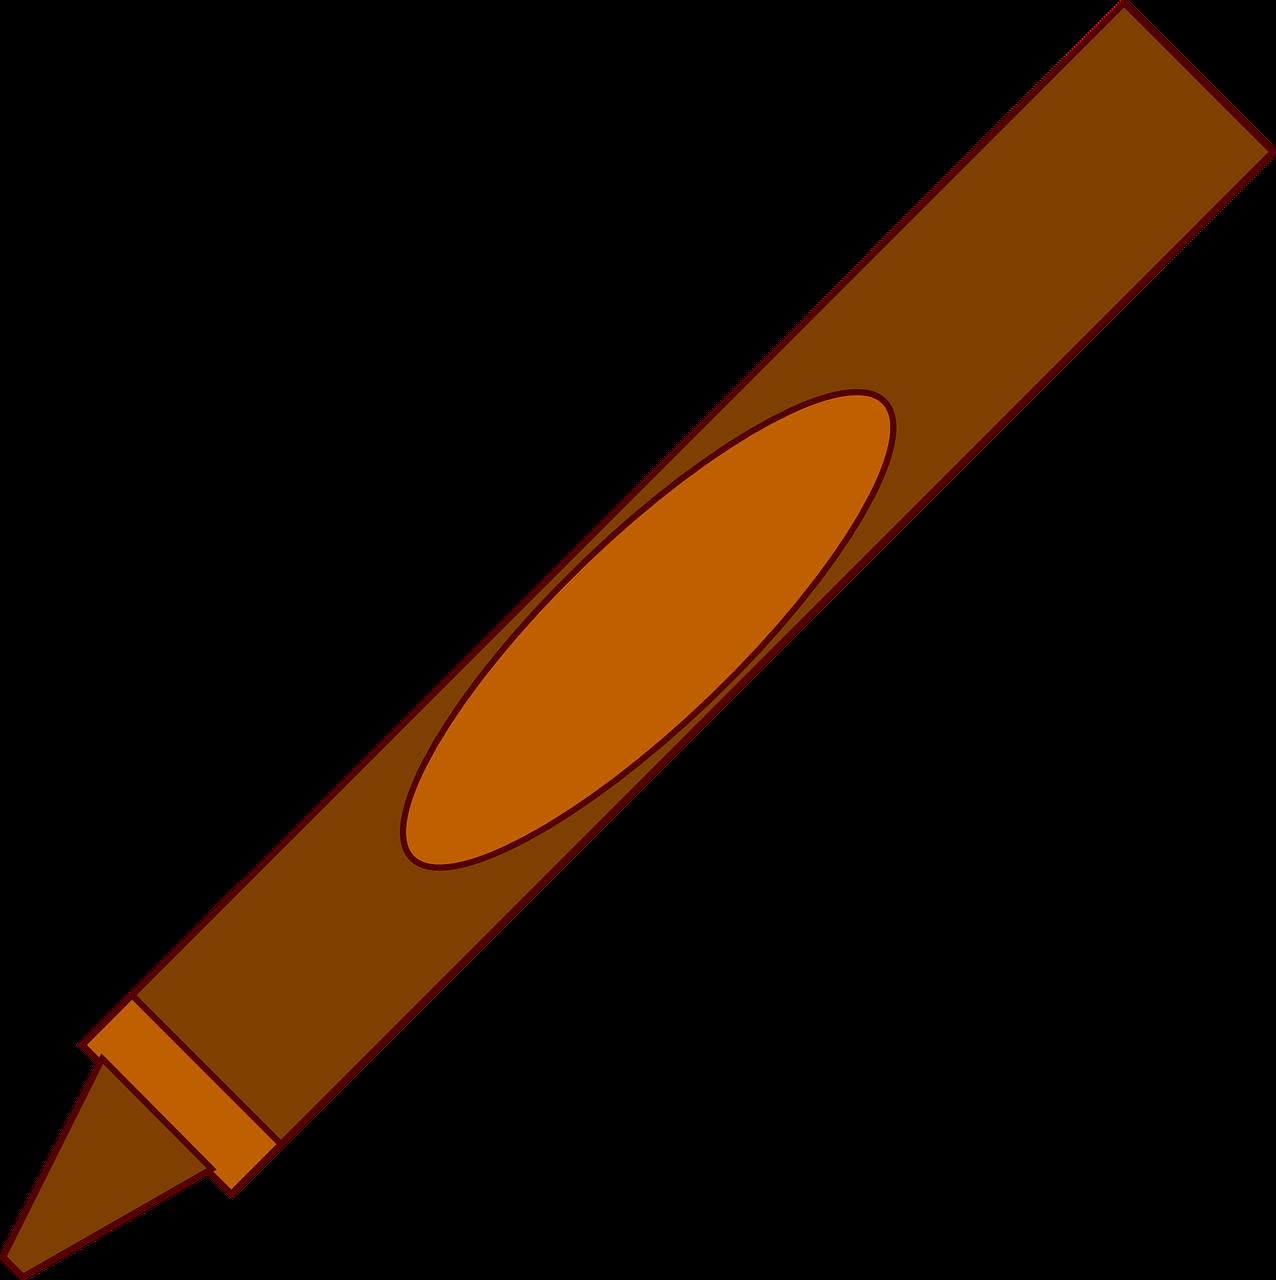 Crayons clipart art room. Pencil crayon office tools